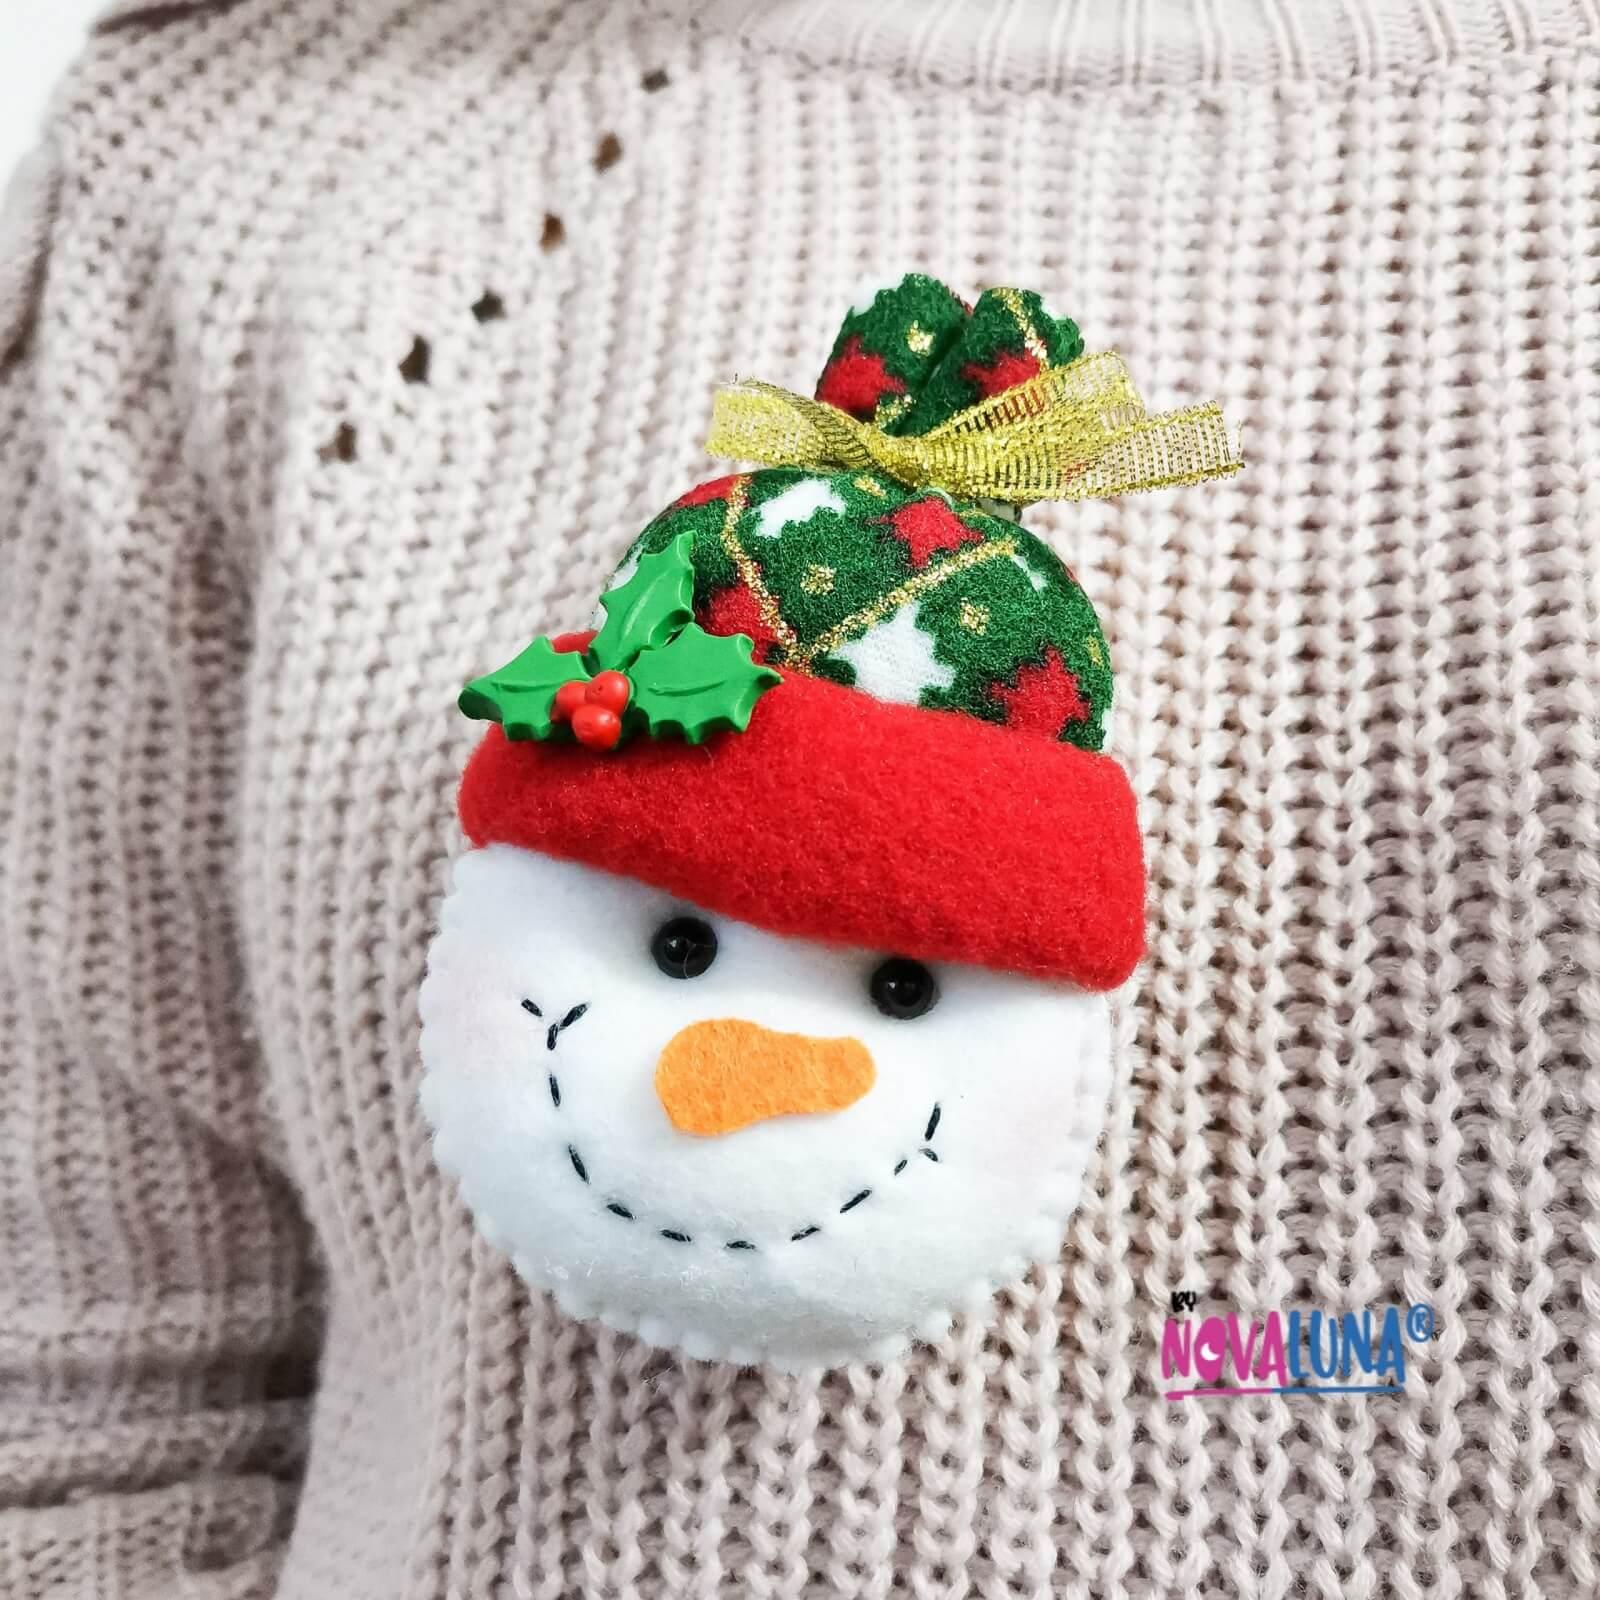 Prendedores navideños _1